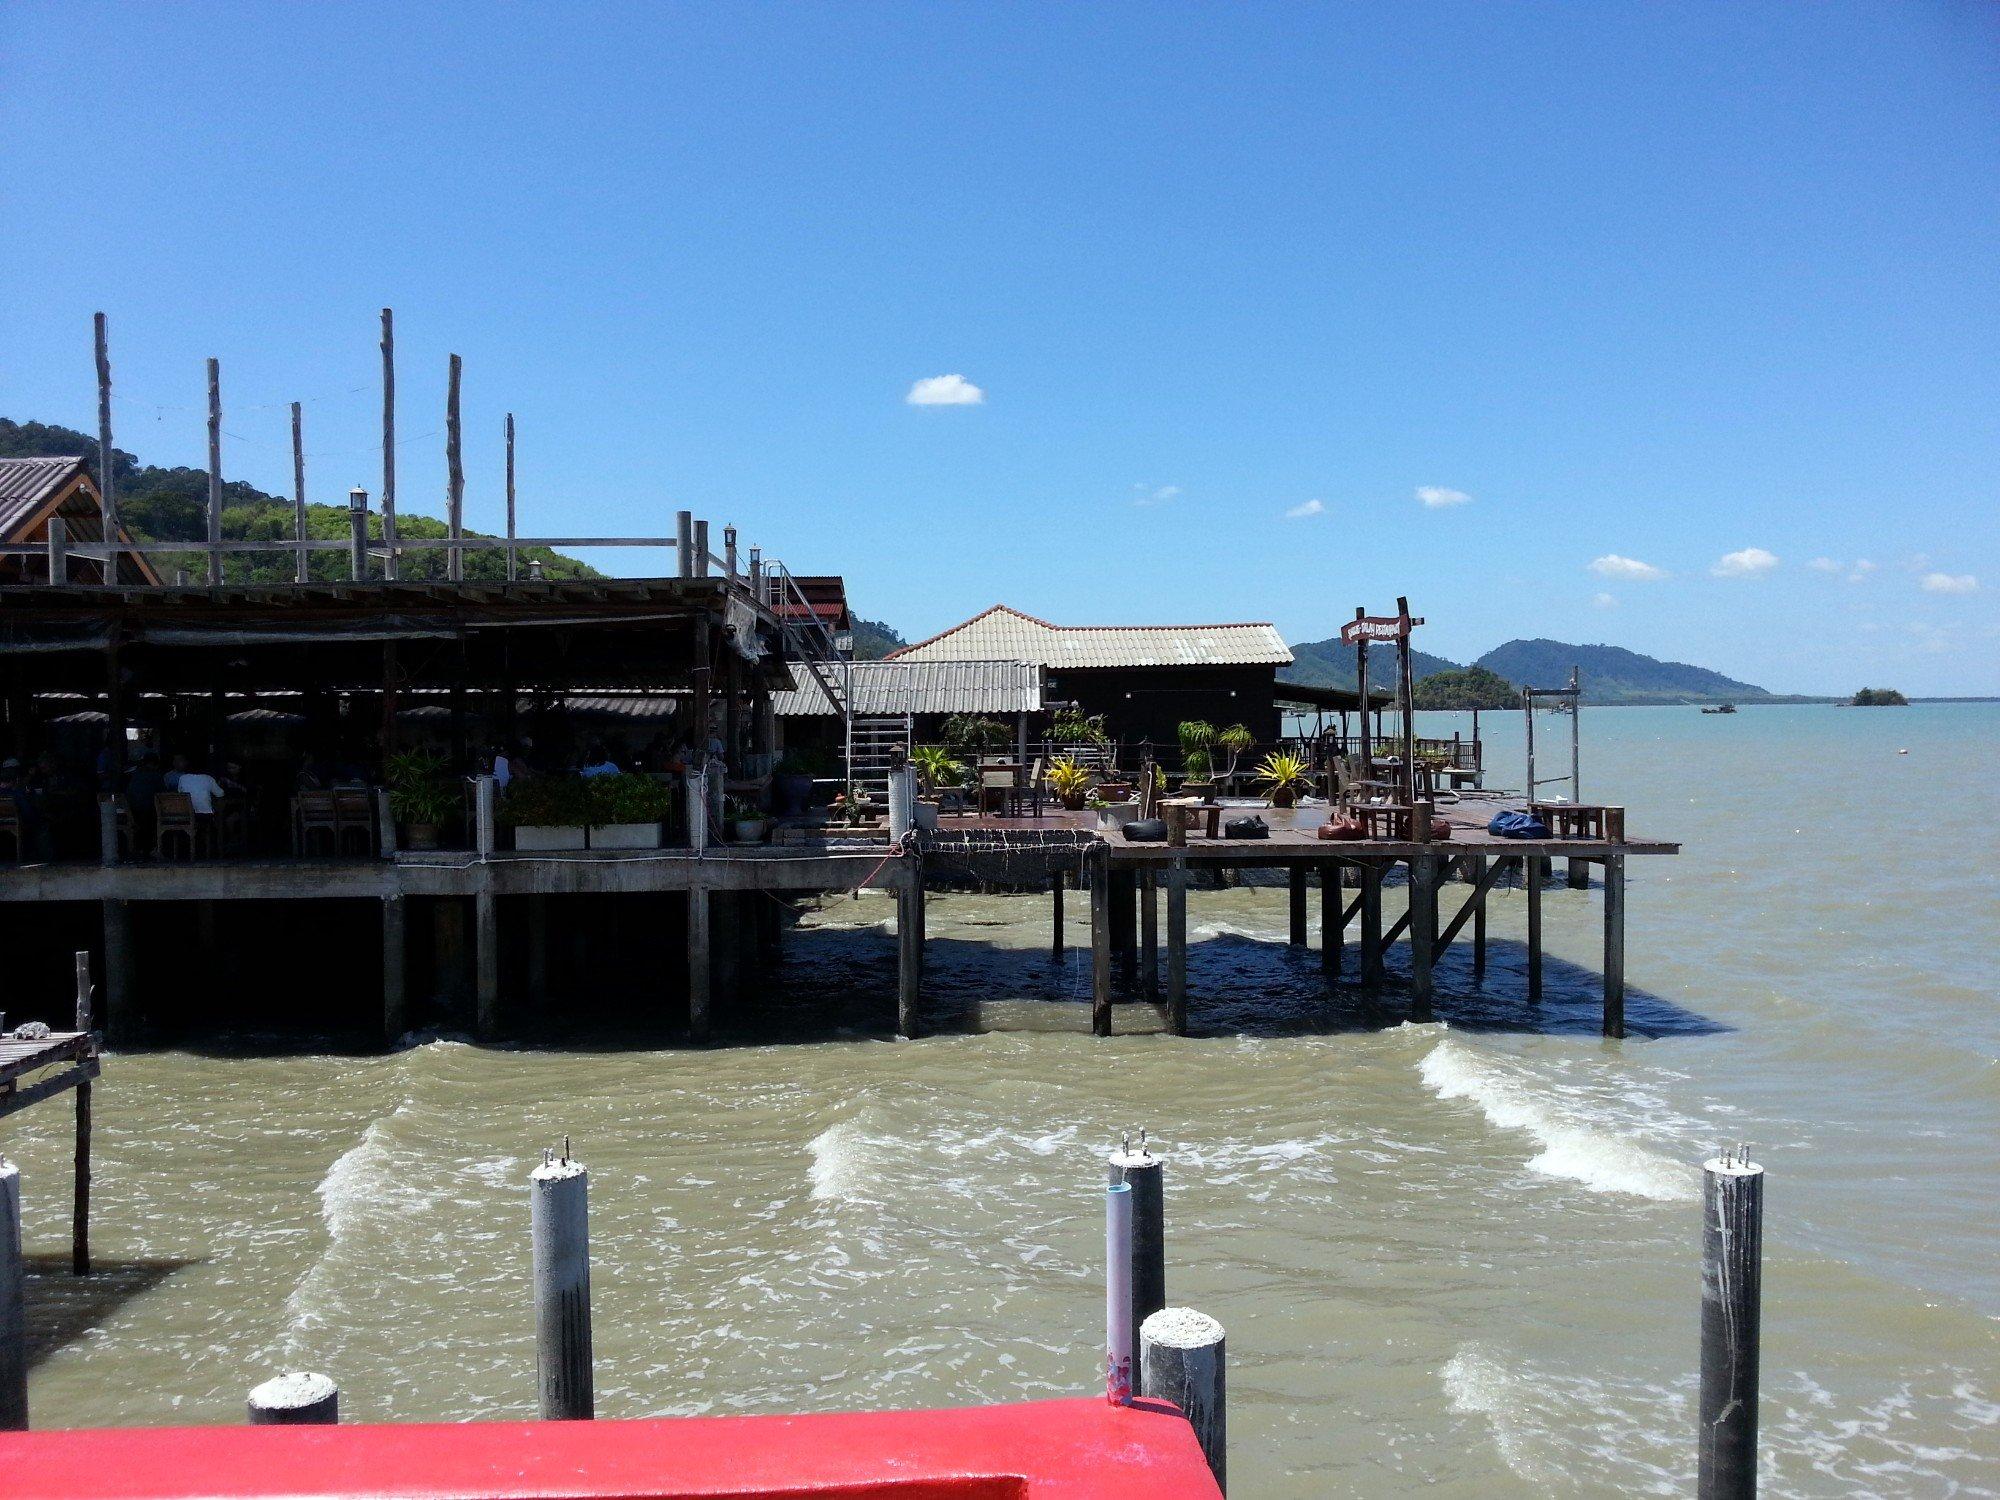 Seafront restaurants in Koh Lanta Old Town